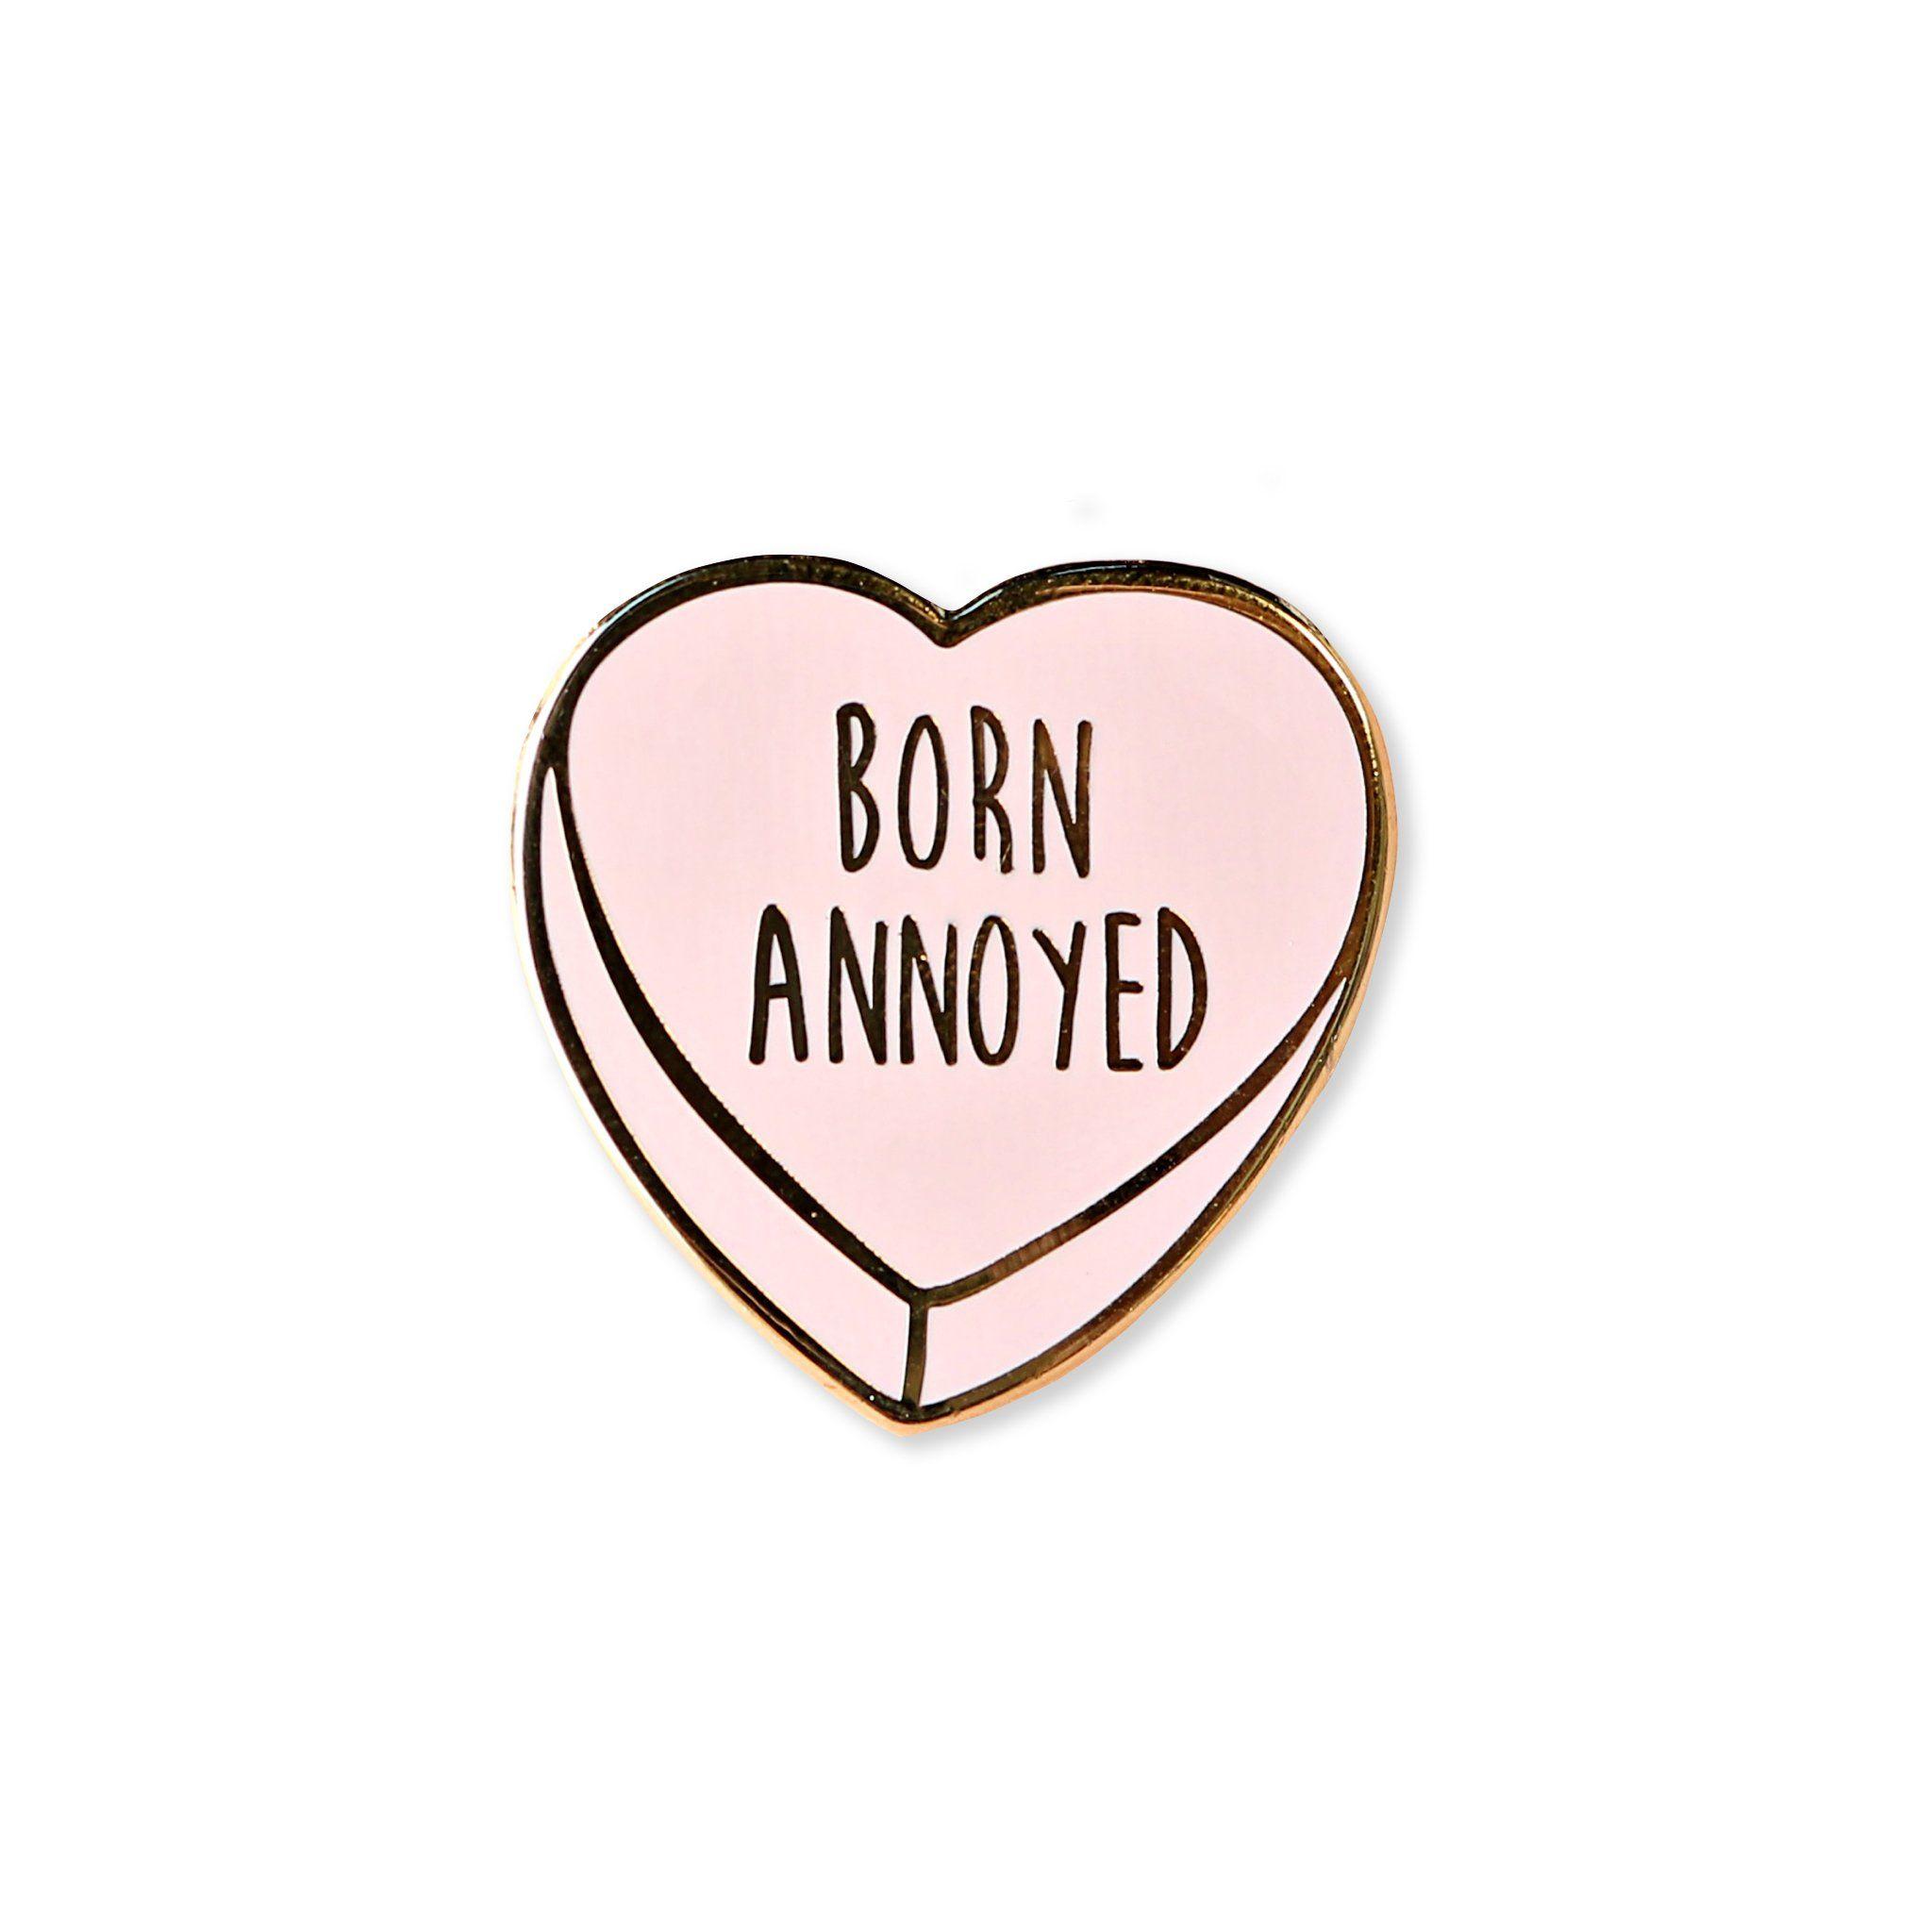 born annoyed | enamel pin    Born annoyed heart enamel pin